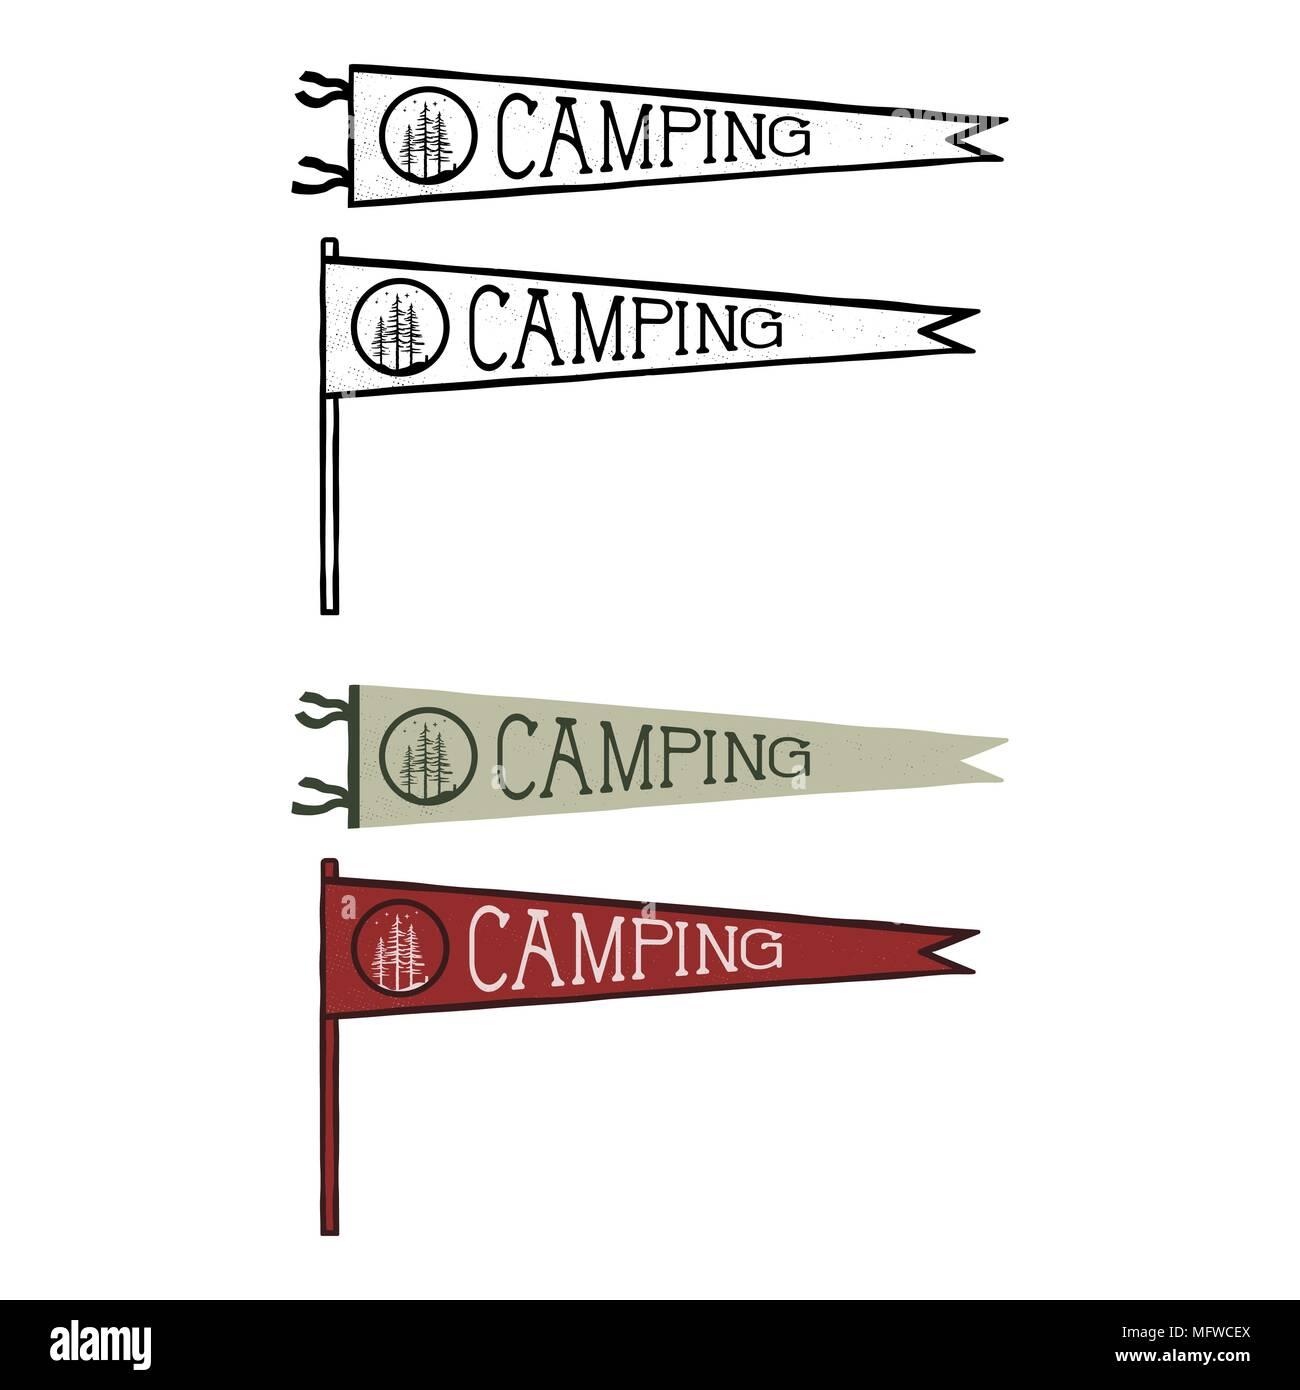 Fantastisch Camping Färbung Seite Galerie - Entry Level Resume ...